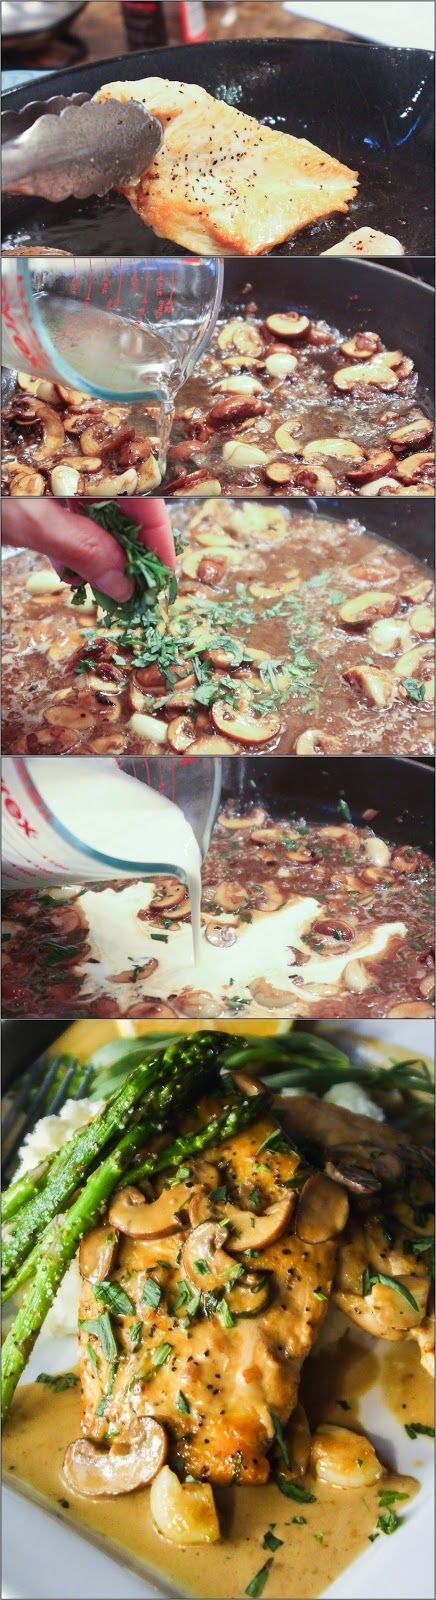 Menu Musings of a Modern American Mom: Pan Seared Chicken in Tarragon Cream Sauce | Tastefulonly